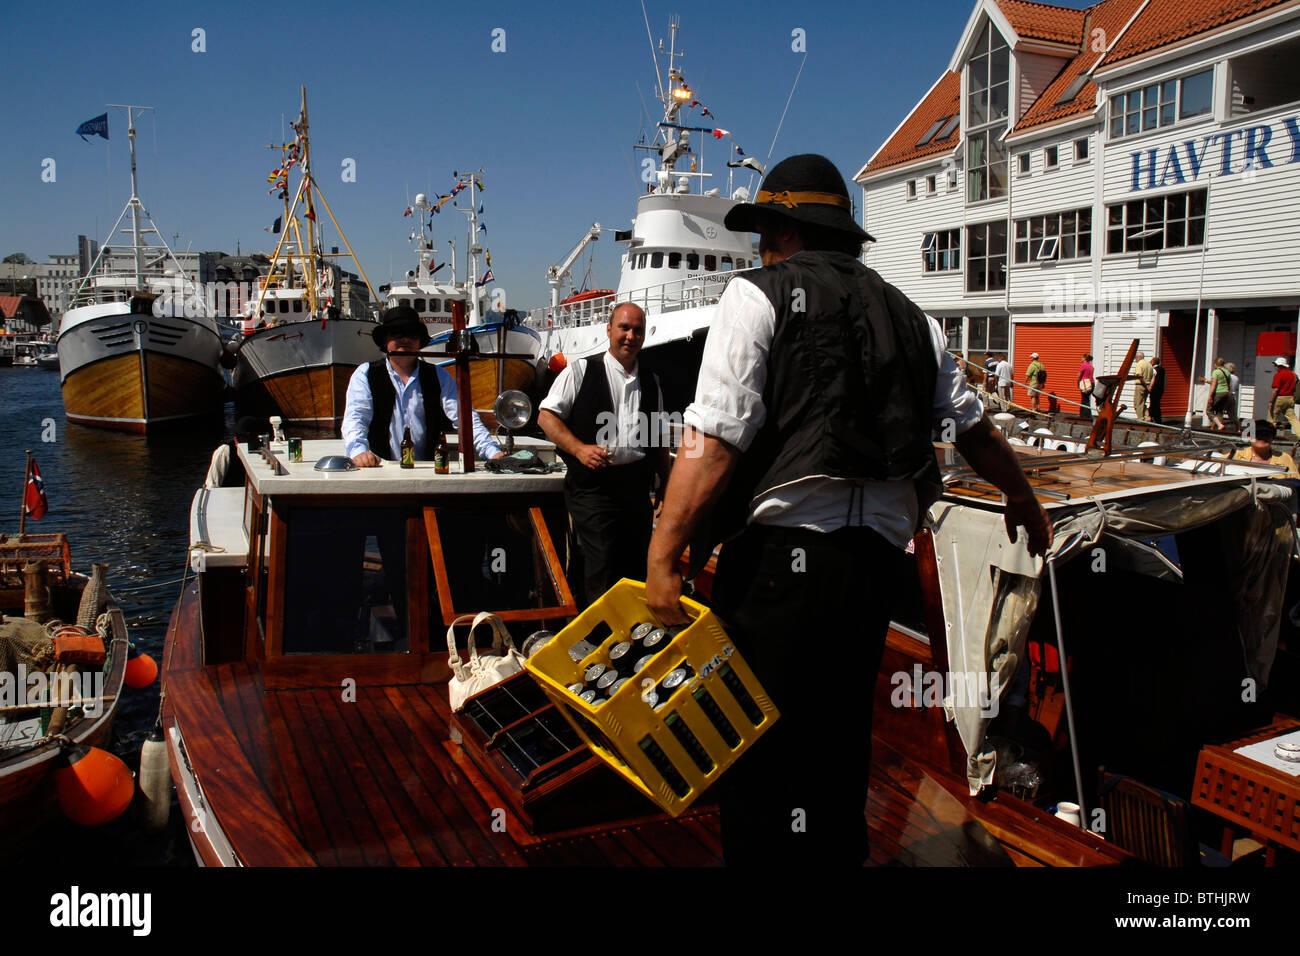 Men drinking beer at The Farmer Day Celebration, Vagen, Old Harbour, Bergen, Norway. - Stock Image